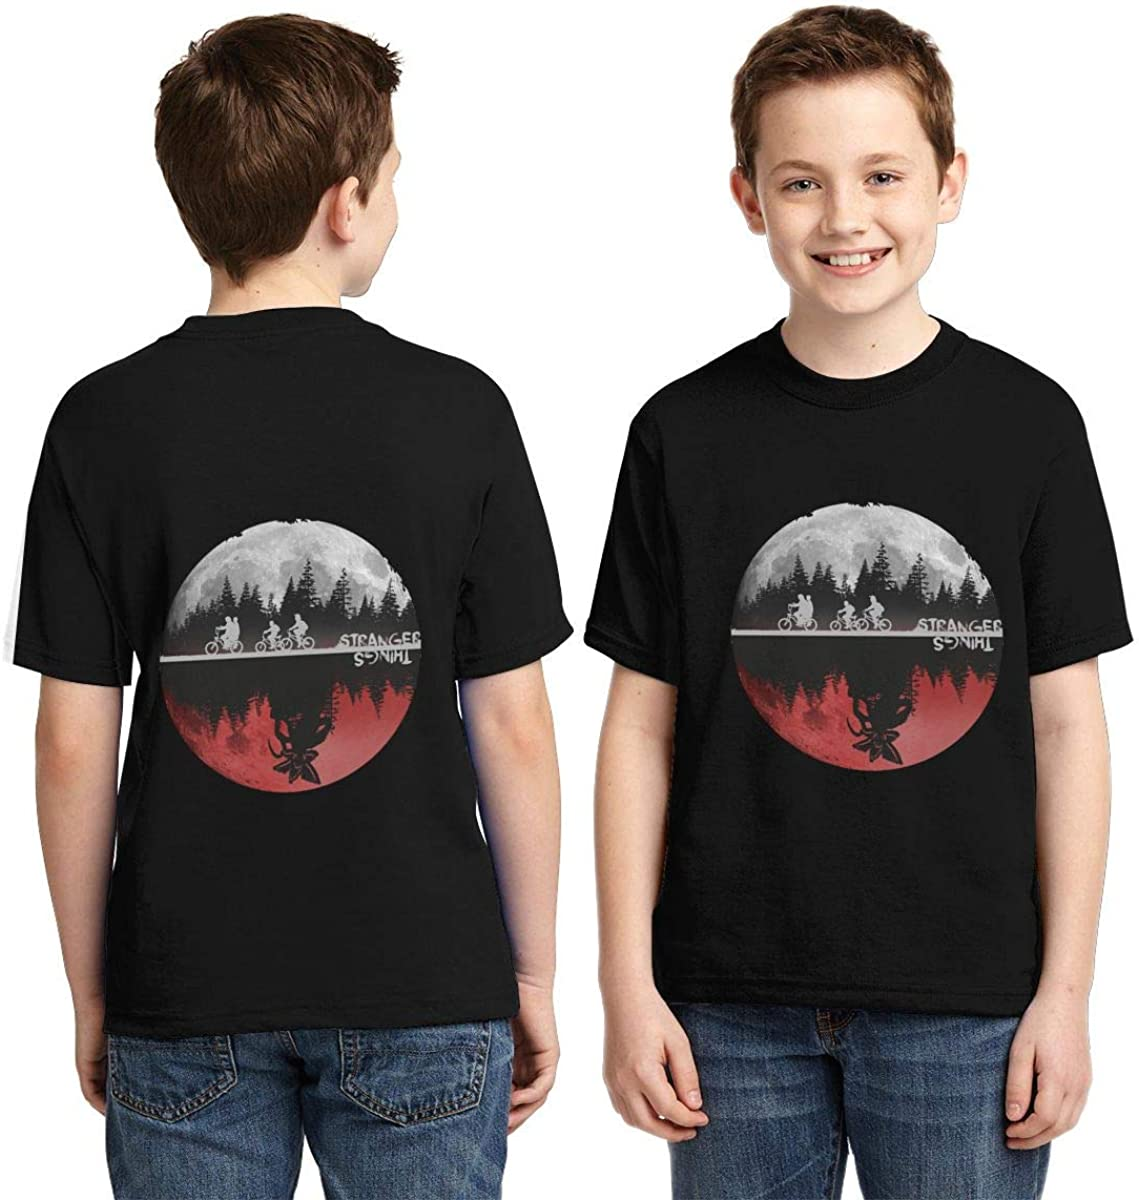 Magicuas Kid T Shirt Stranger 2 Kids Things Fan Tee for Boy Girl Black